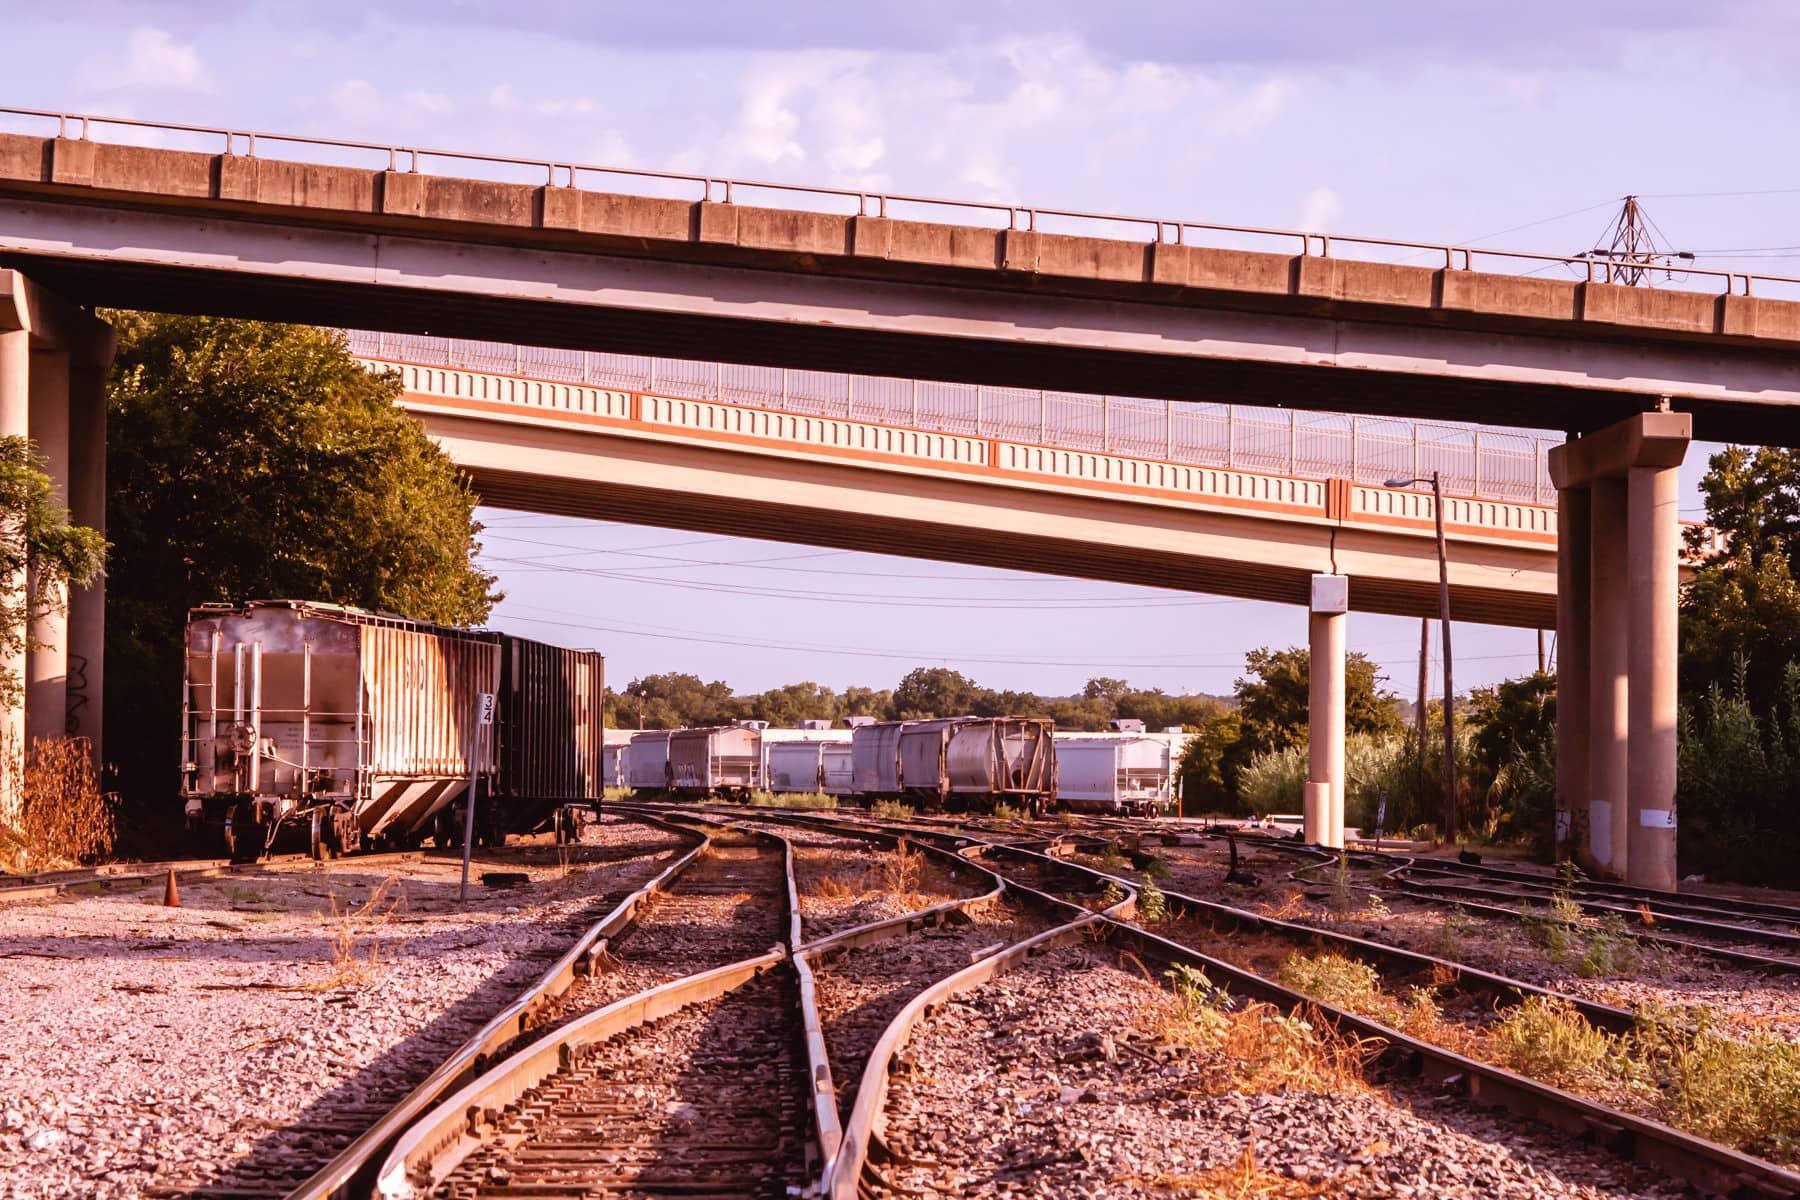 Rail cars sit idle underneath the Weatherford Street and Belknap Street bridges in Fort Worth, Texas.